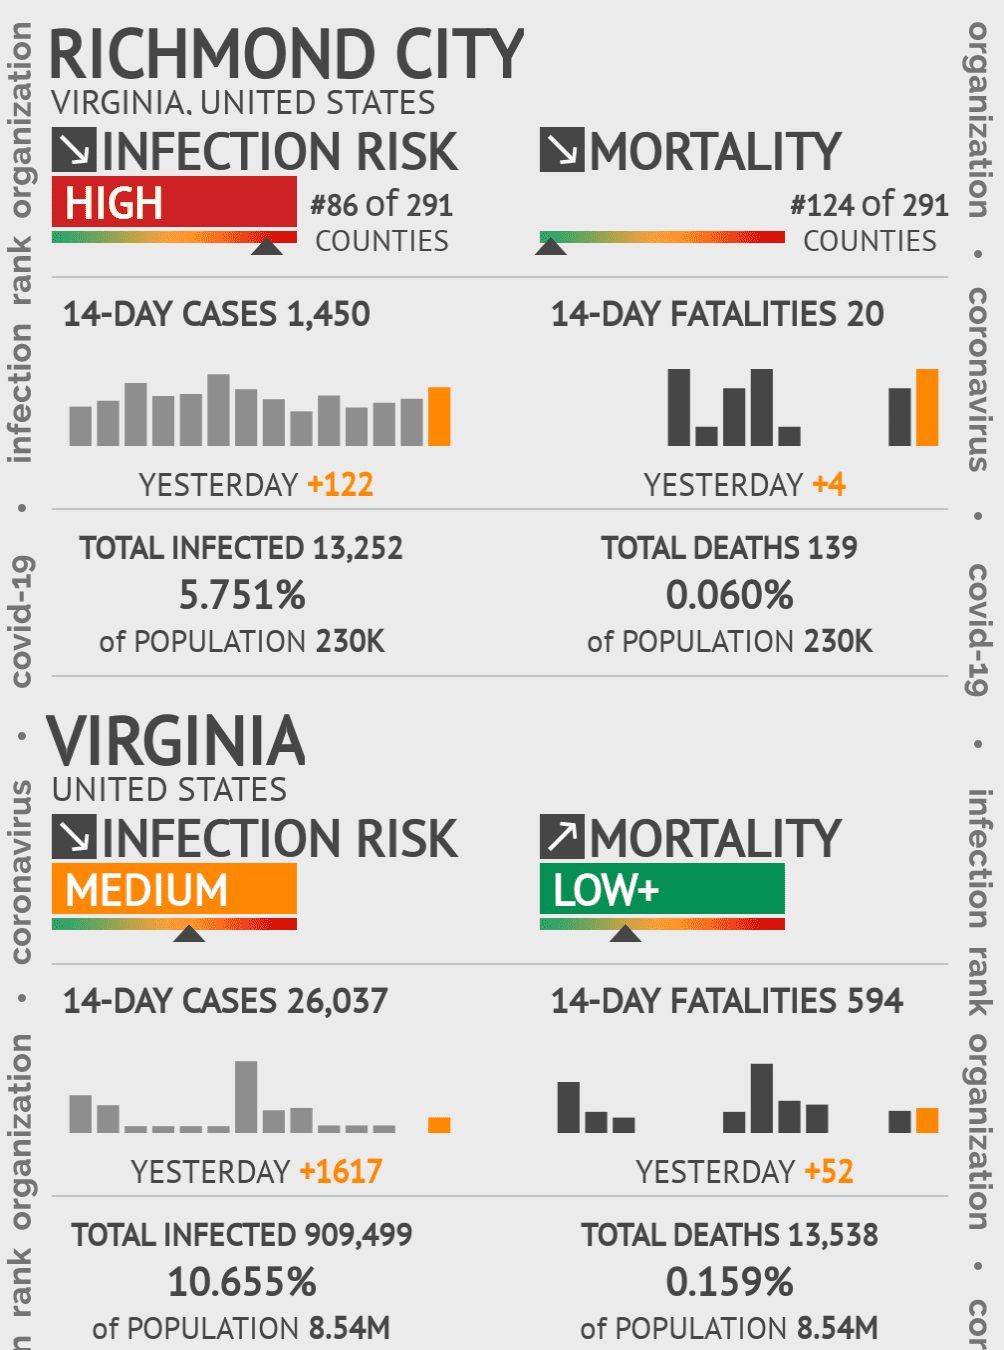 Richmond City Coronavirus Covid-19 Risk of Infection on February 04, 2021